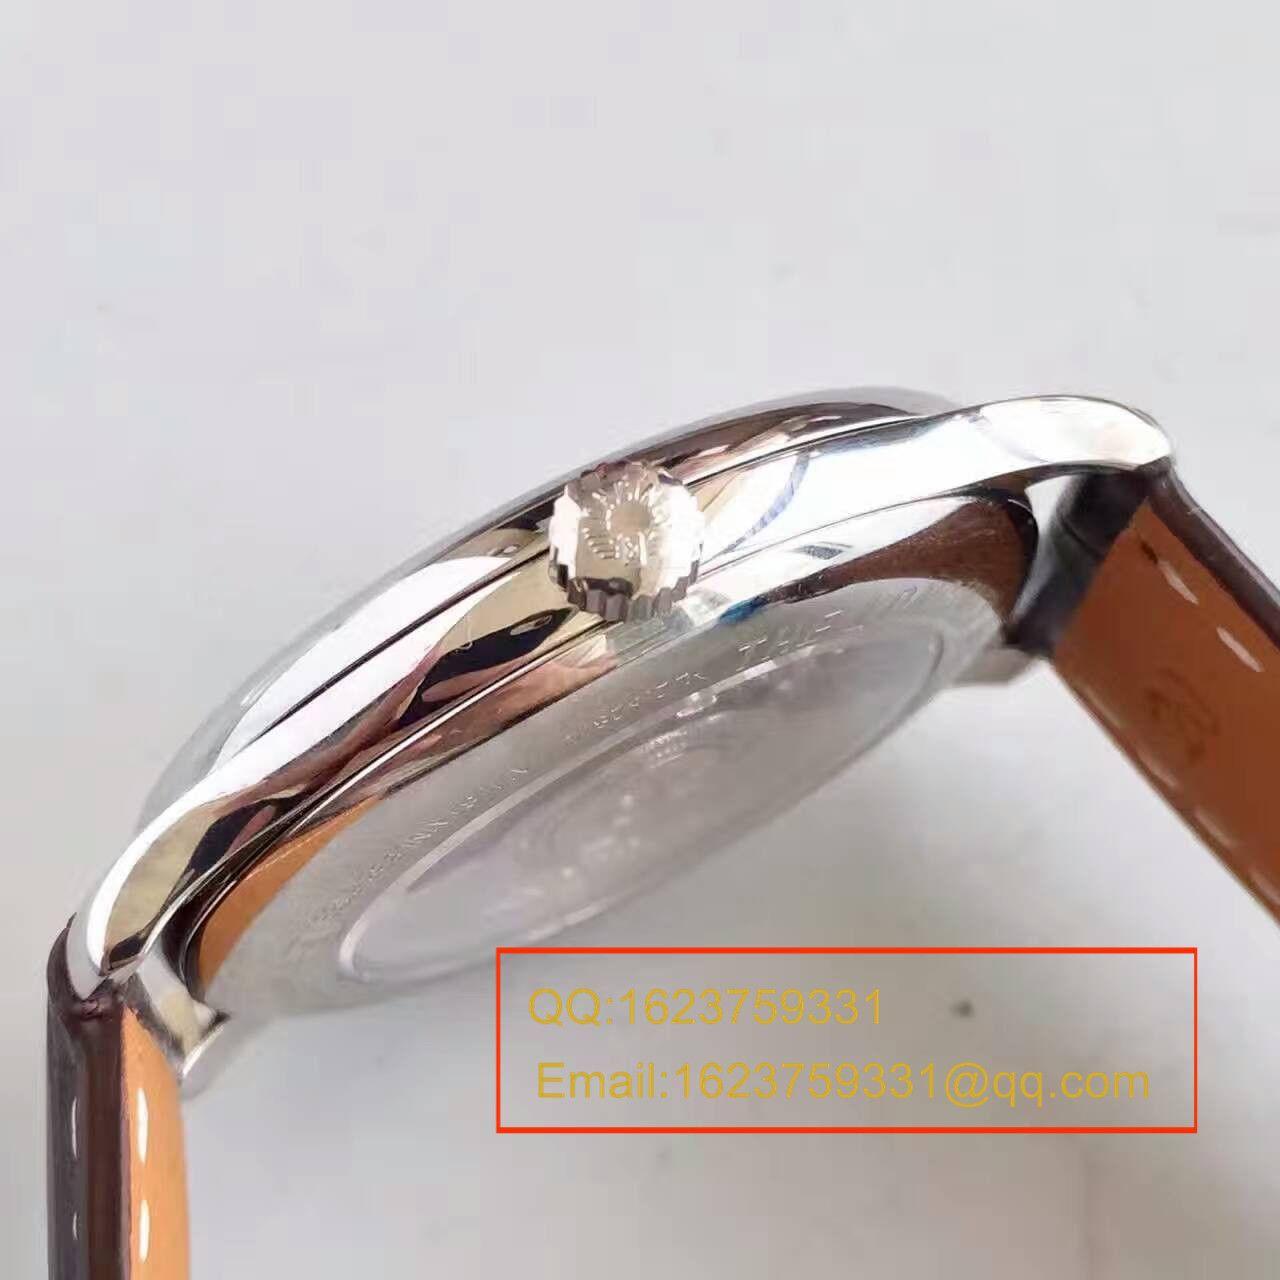 【MK厂一比一超A精仿手表】浪琴LONGINES制表传统《名匠系列》L2.518.4.78.3机械腕表